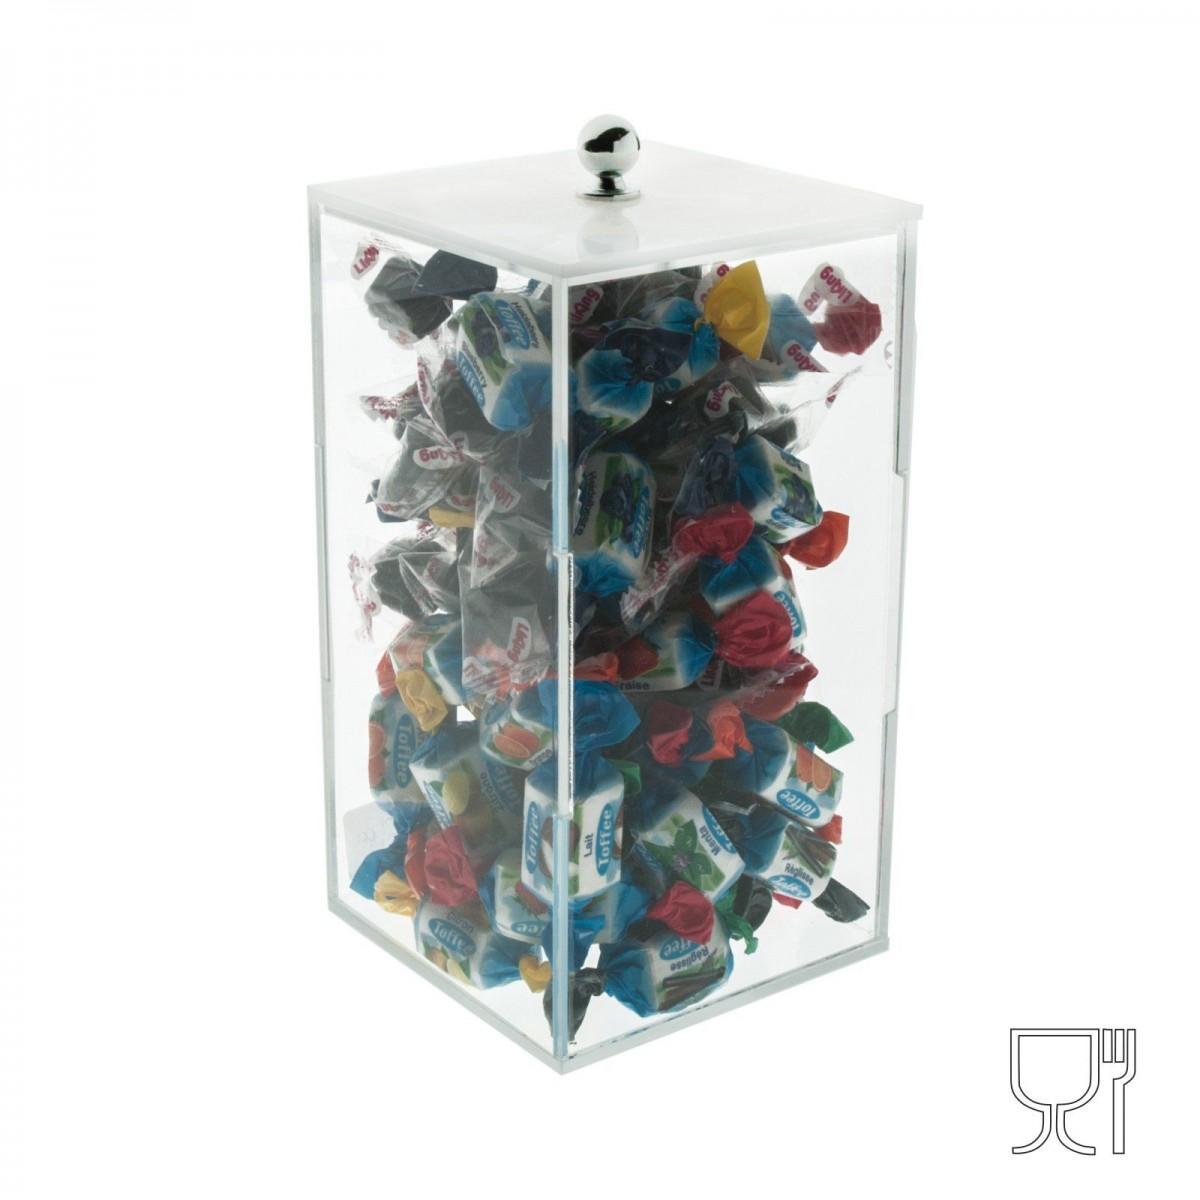 E-072 PC - Porta caramelle in plexiglass trasparente a base quadrata - Misure: 10 x 10 x 18 cm